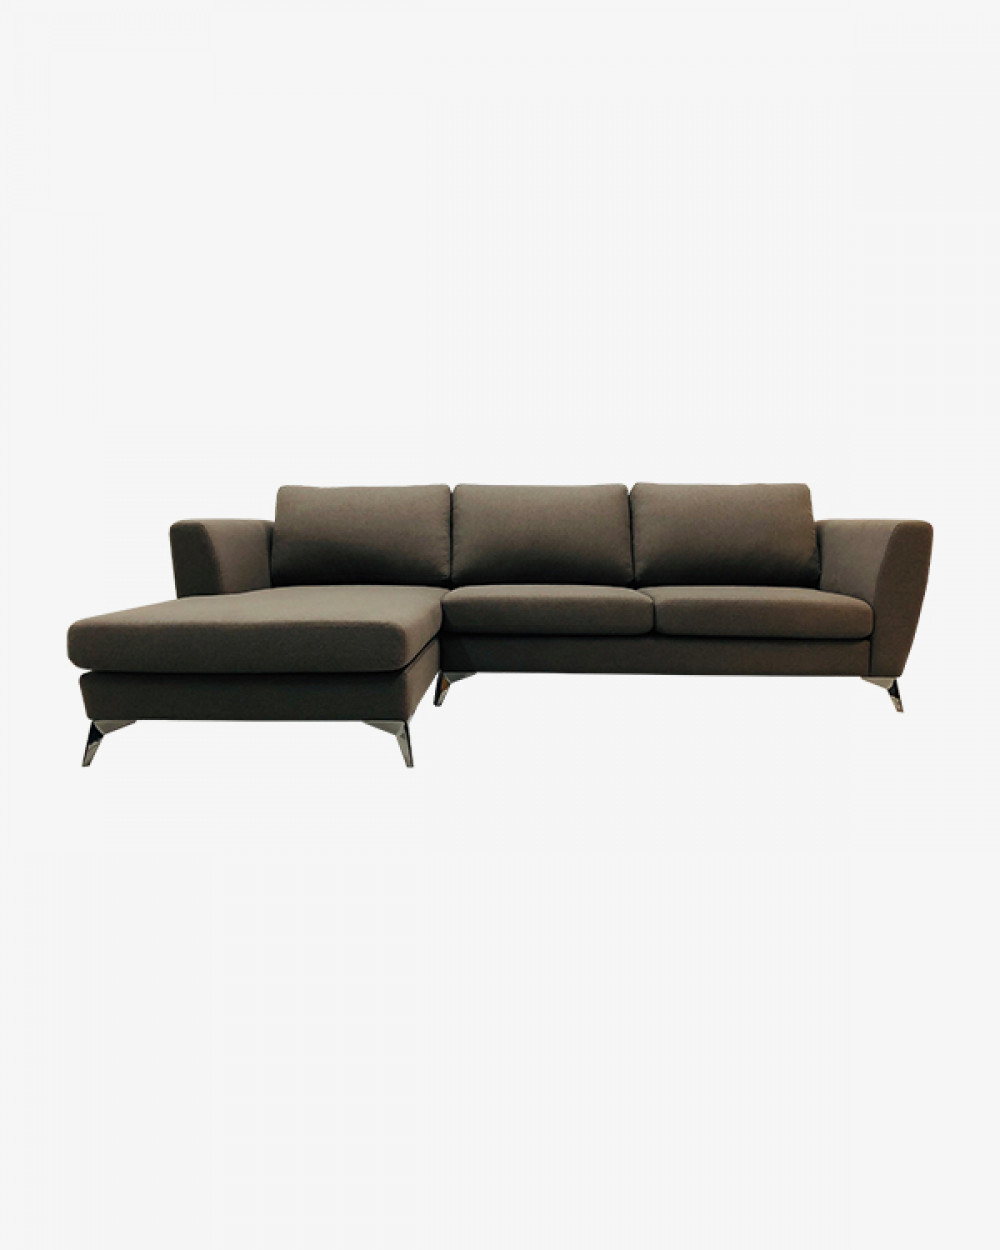 Lucerne Sofa | 3+L Seater